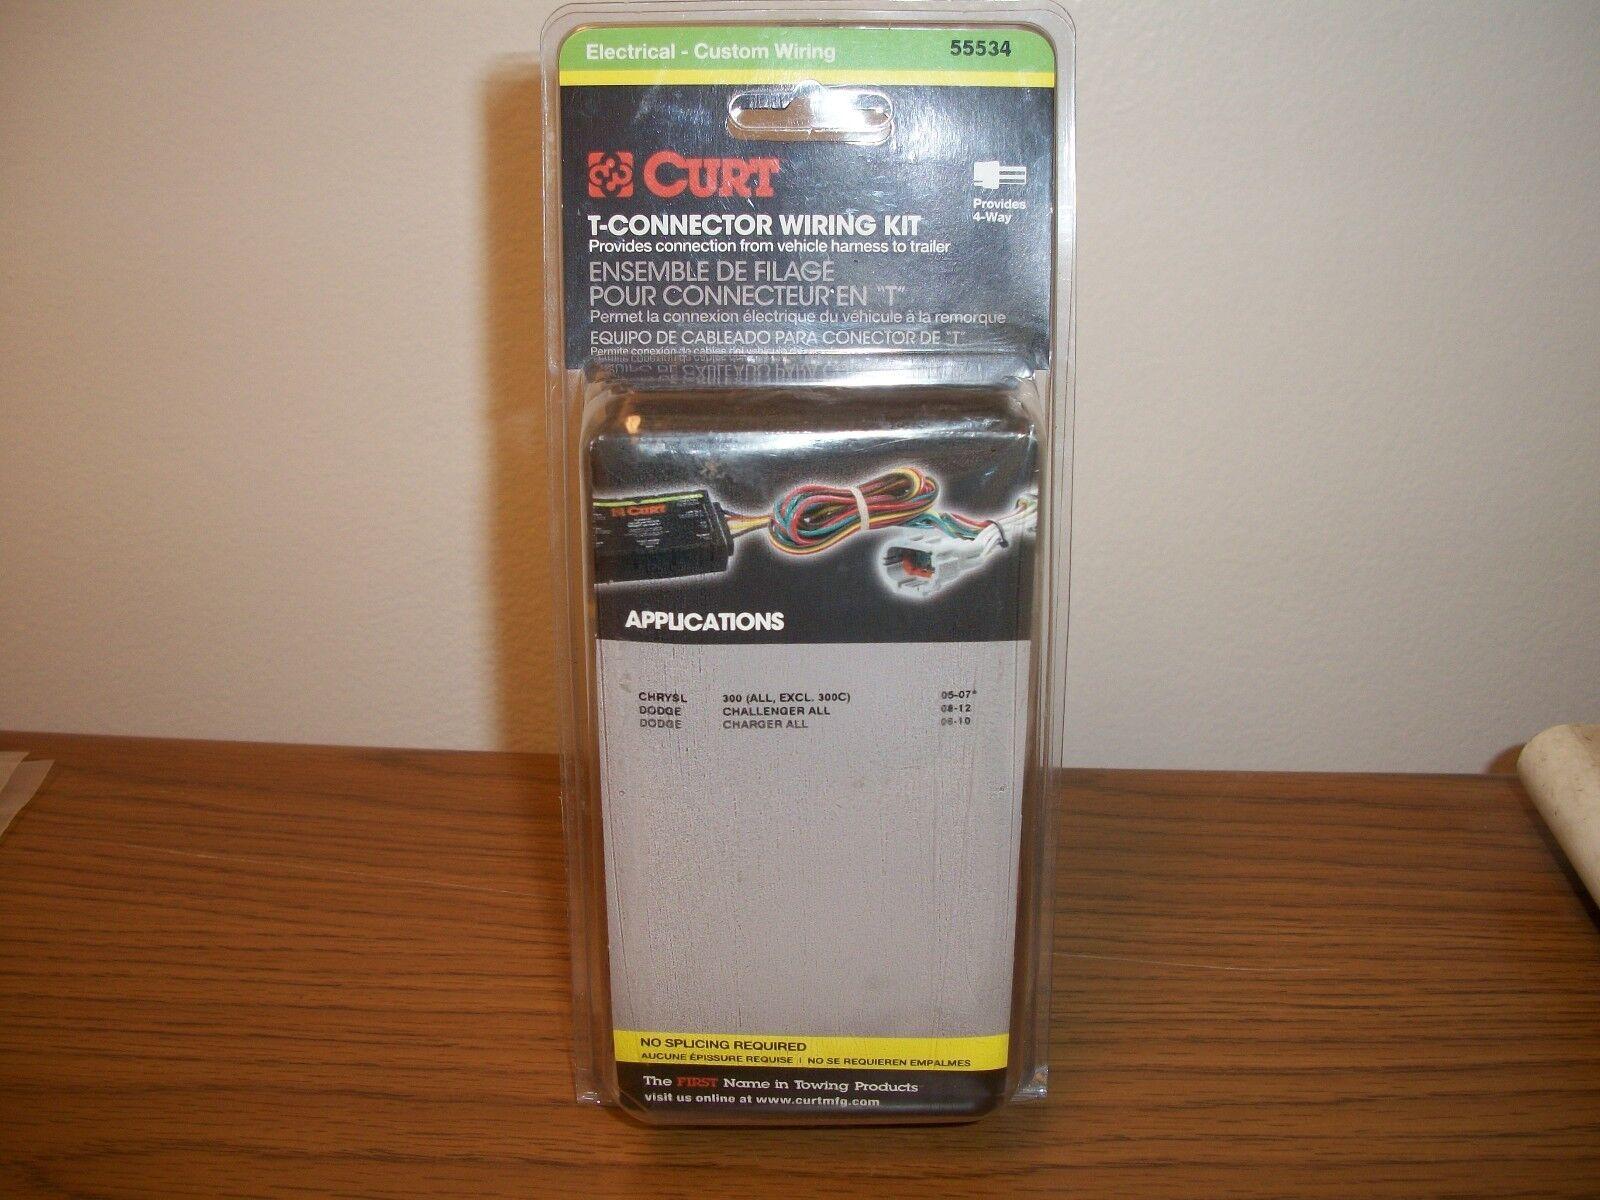 Trailer Connector Kit Custom Wiring Harness Curt Manufacturing 55534 T Rescontentglobalinflowinflowcomponentcancel